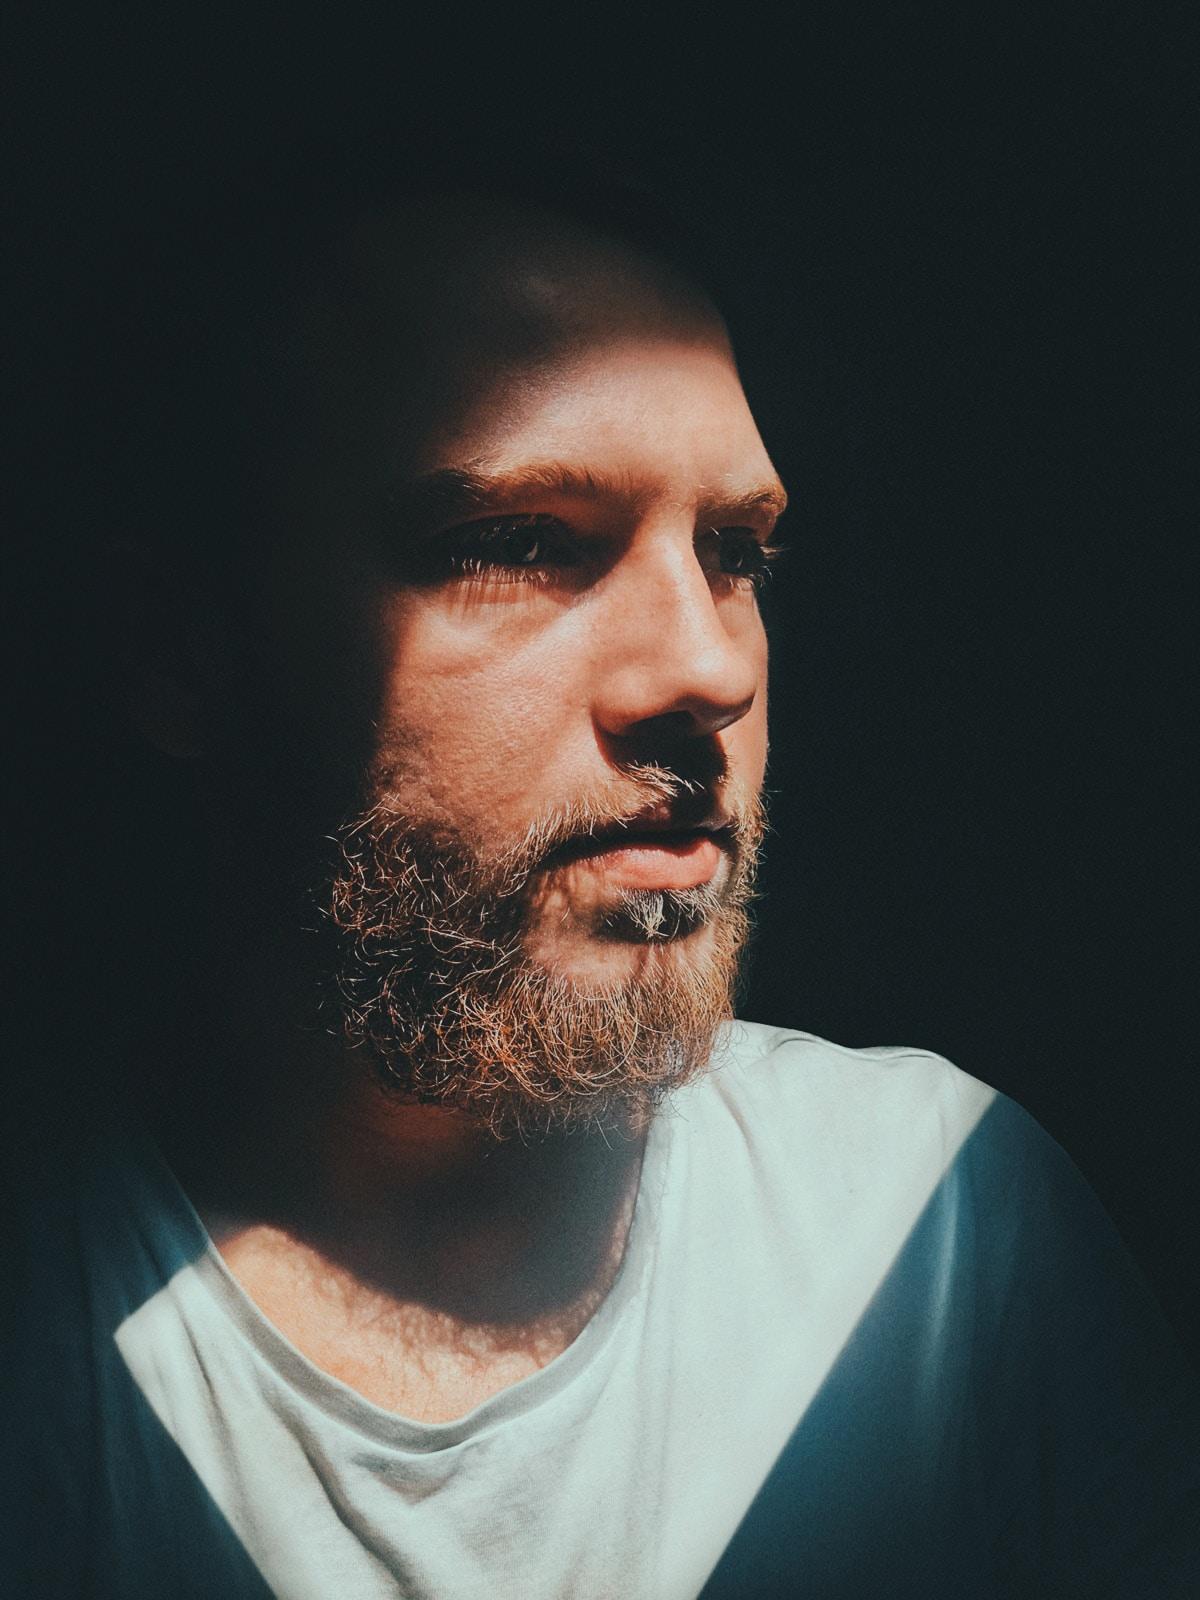 Go to Florian Metzner's profile